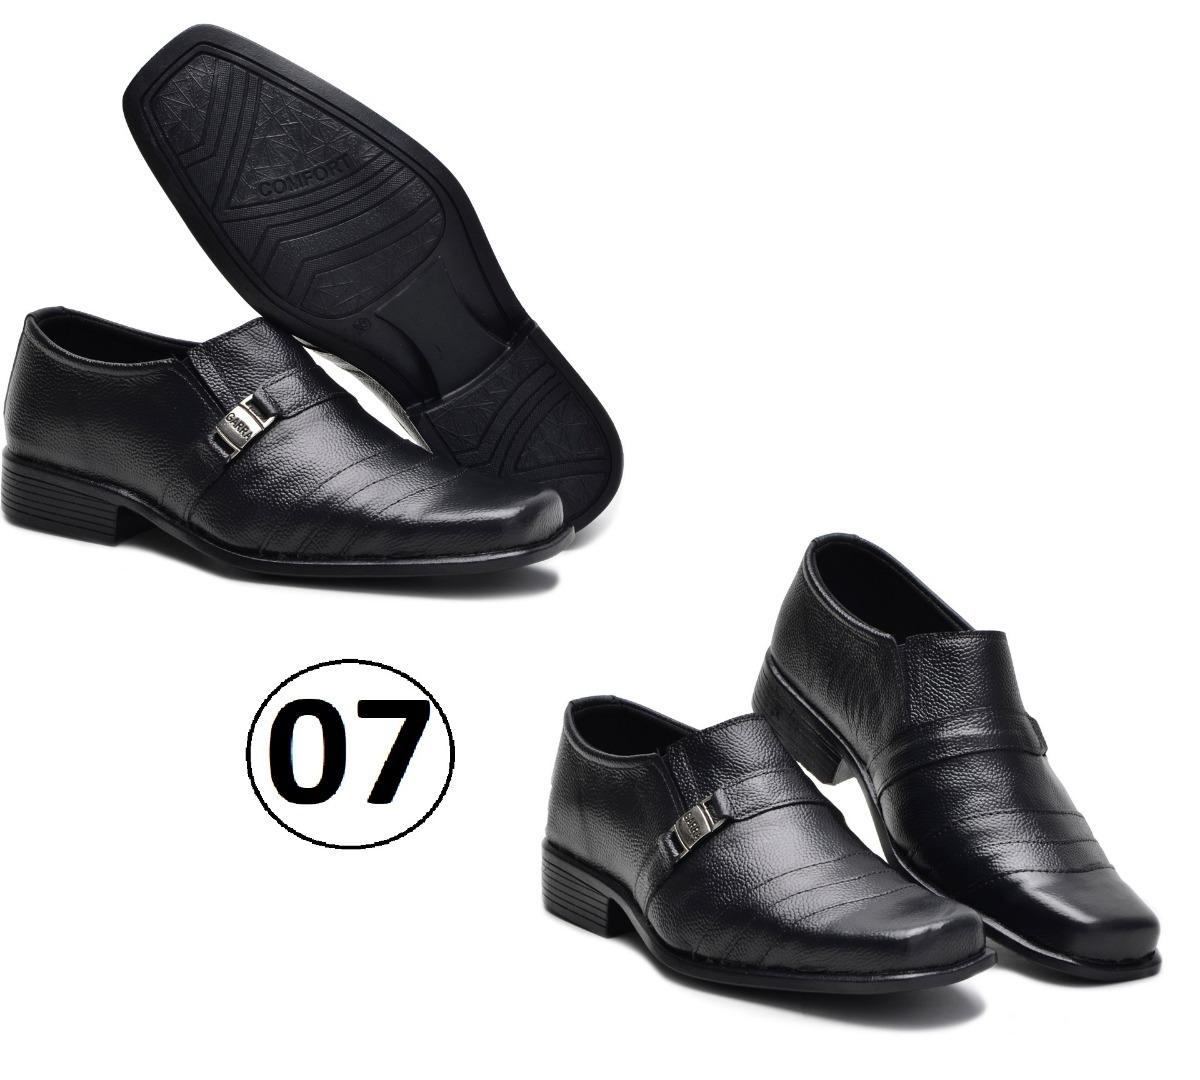 8e1505d818 kit 3 pares sapato social masculino couro vários modelos top. Carregando  zoom.